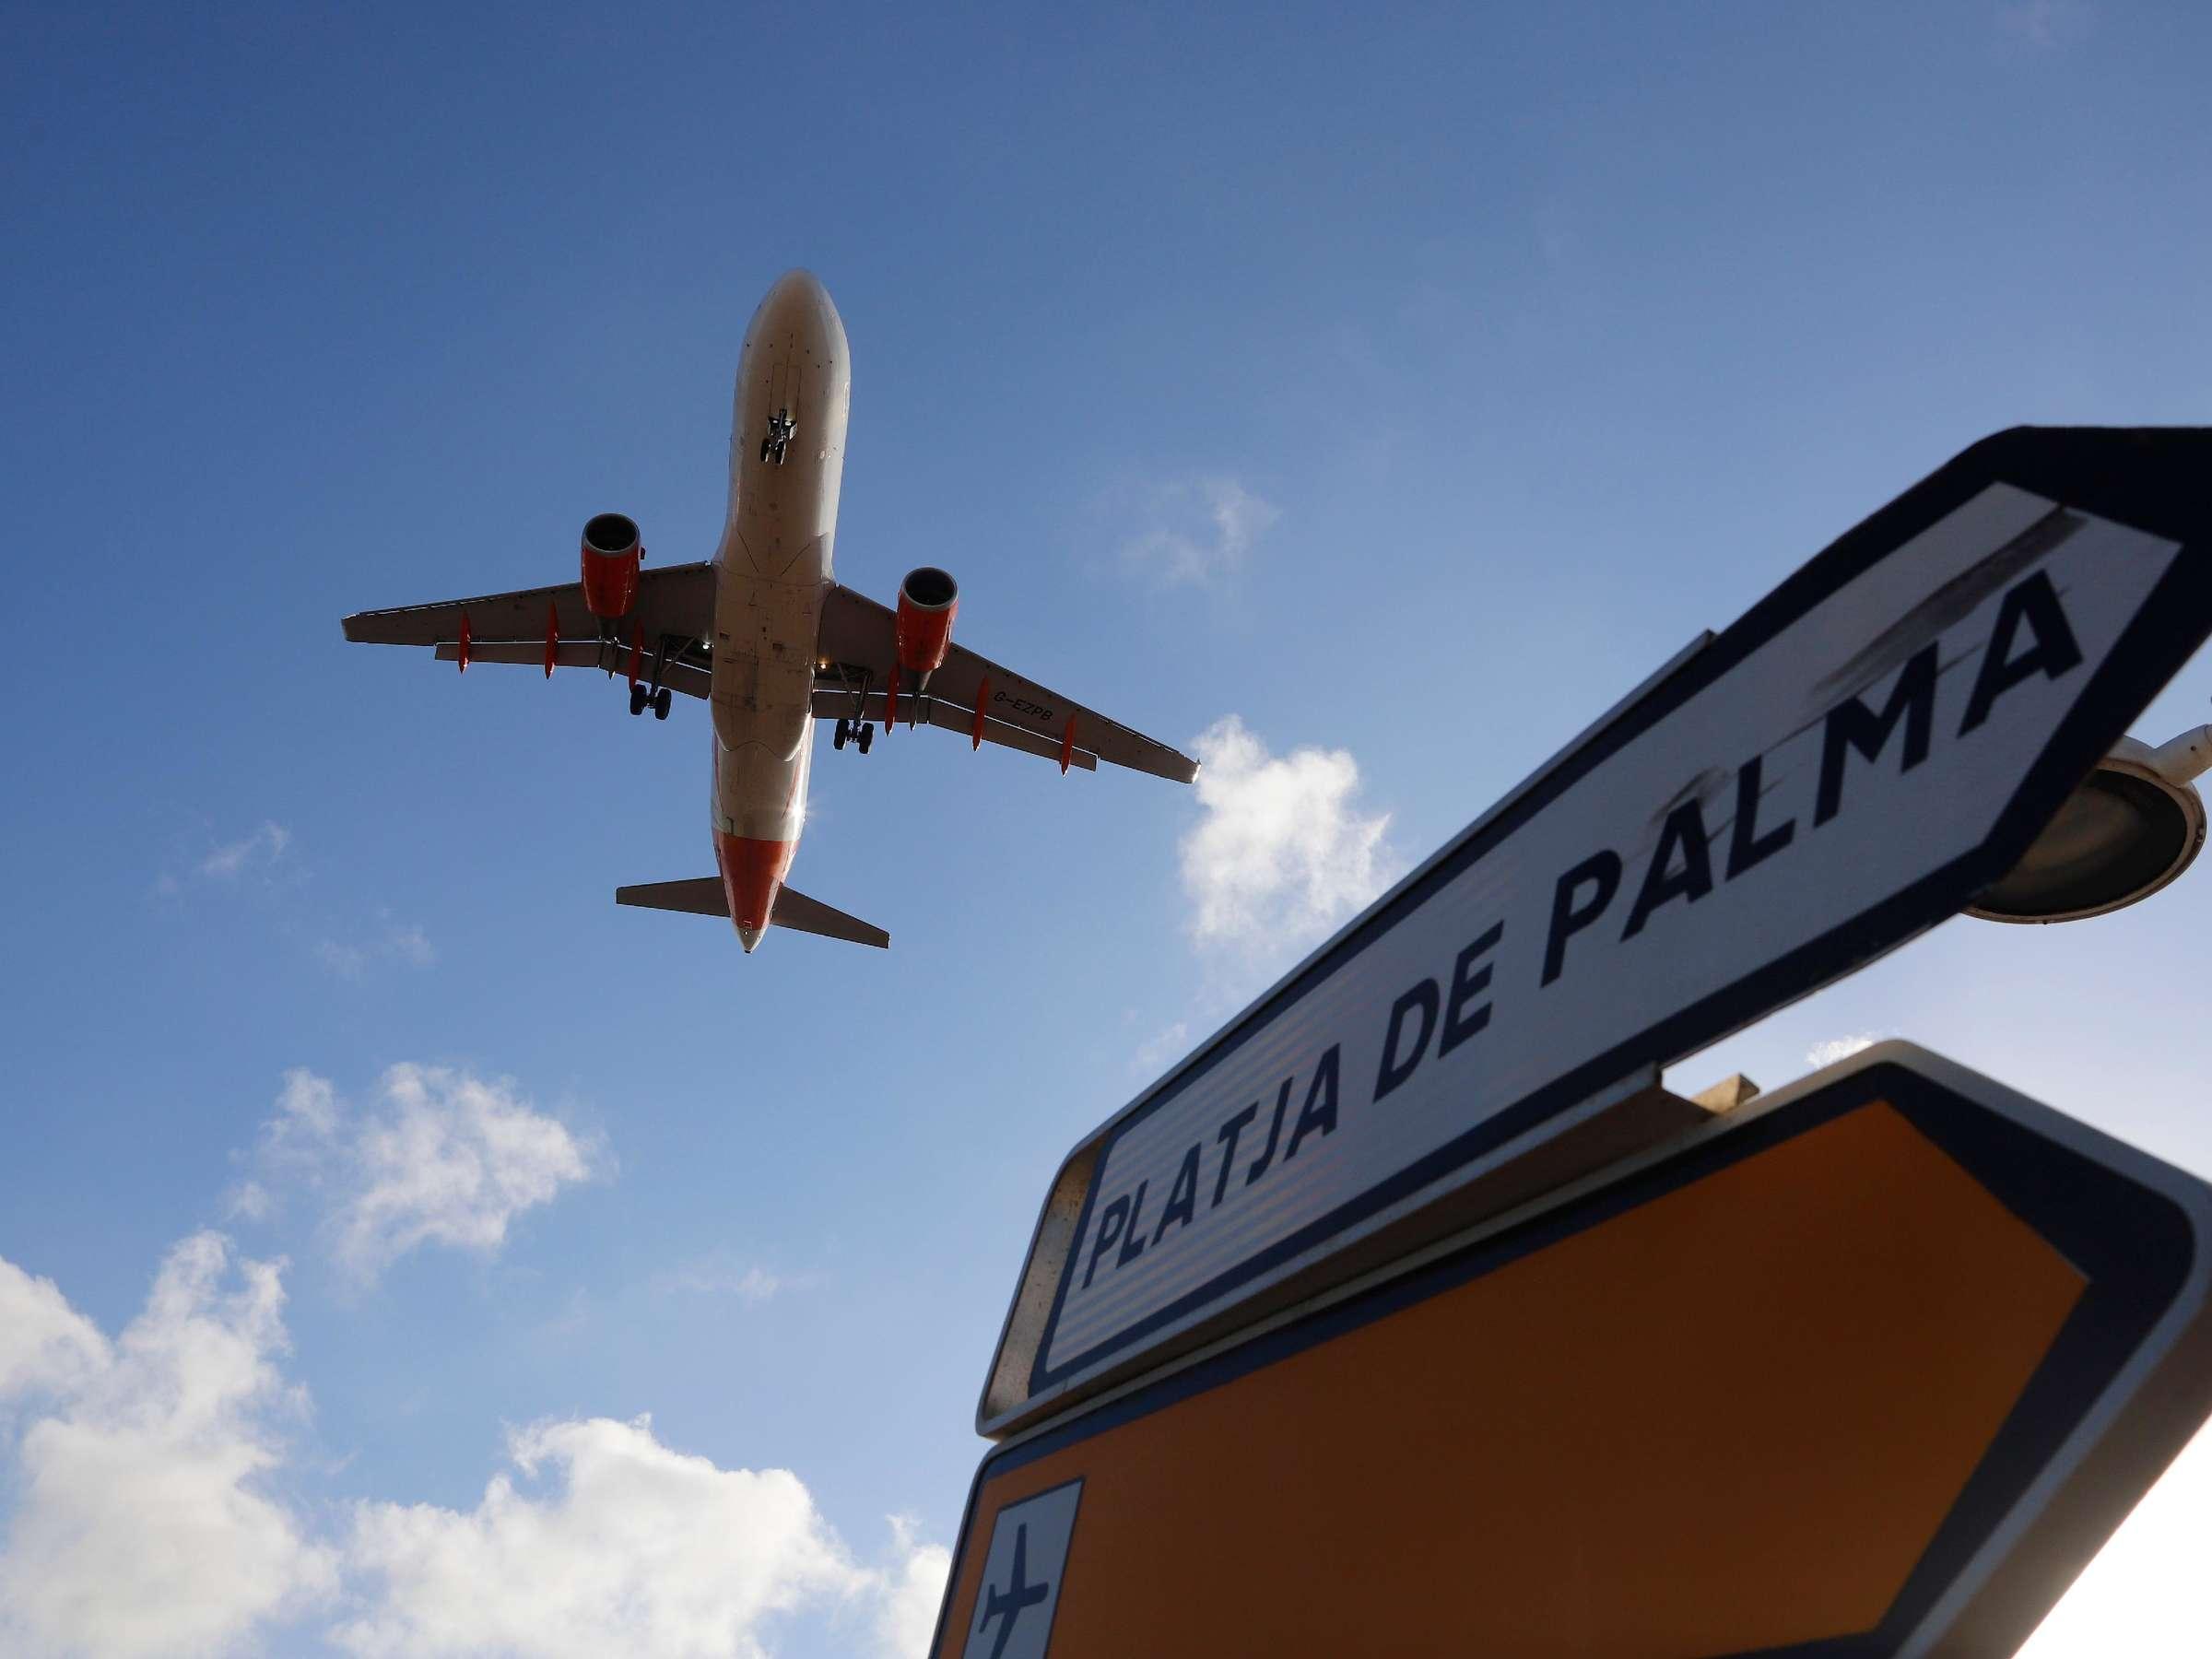 Mallorca Jetzt Hochinzidenz Gebiet Corona Regeln Fur Urlaub